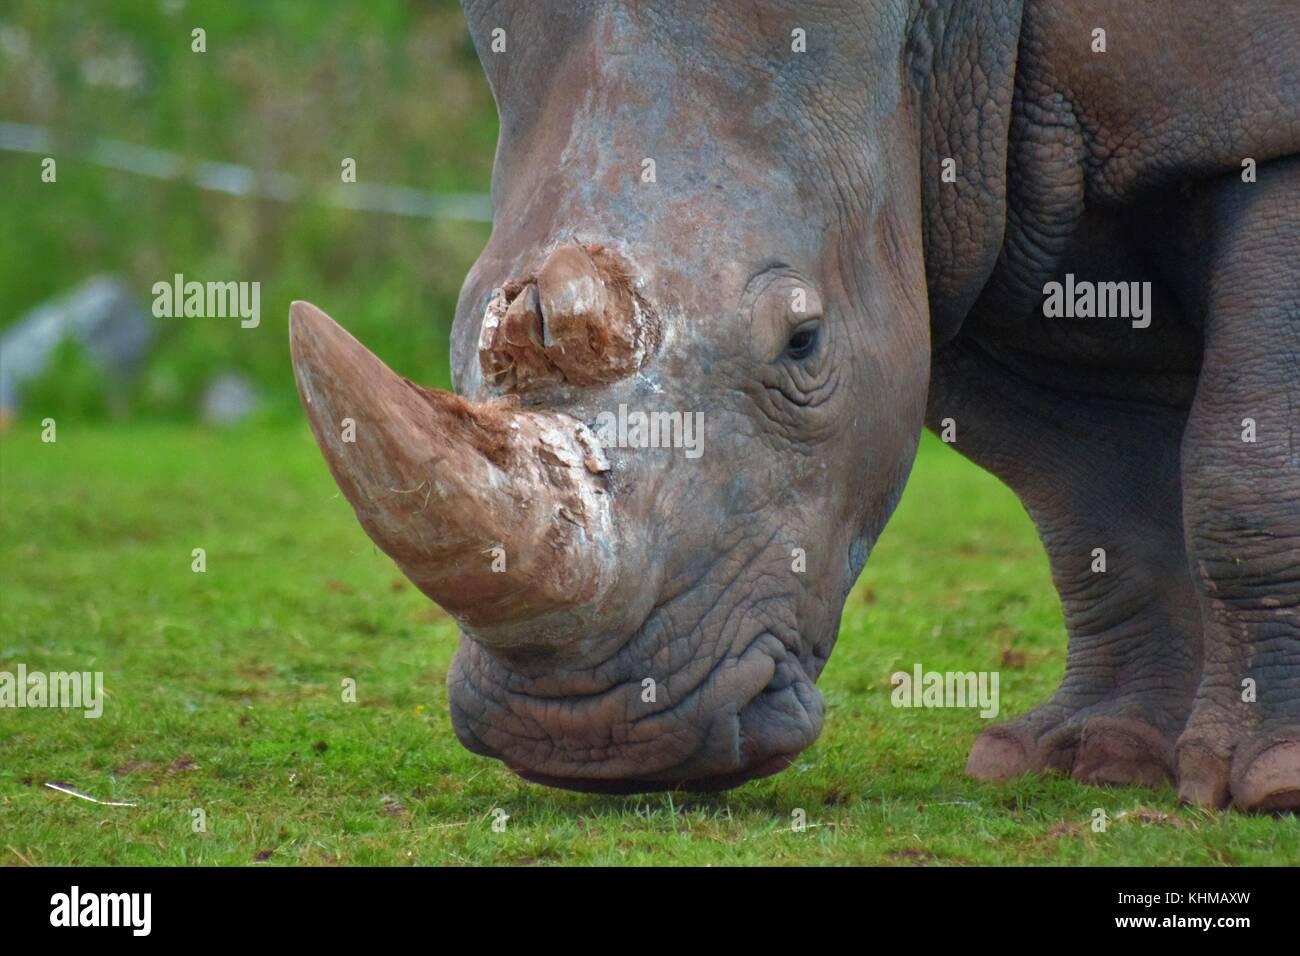 southern white rhinoceros - Stock Image